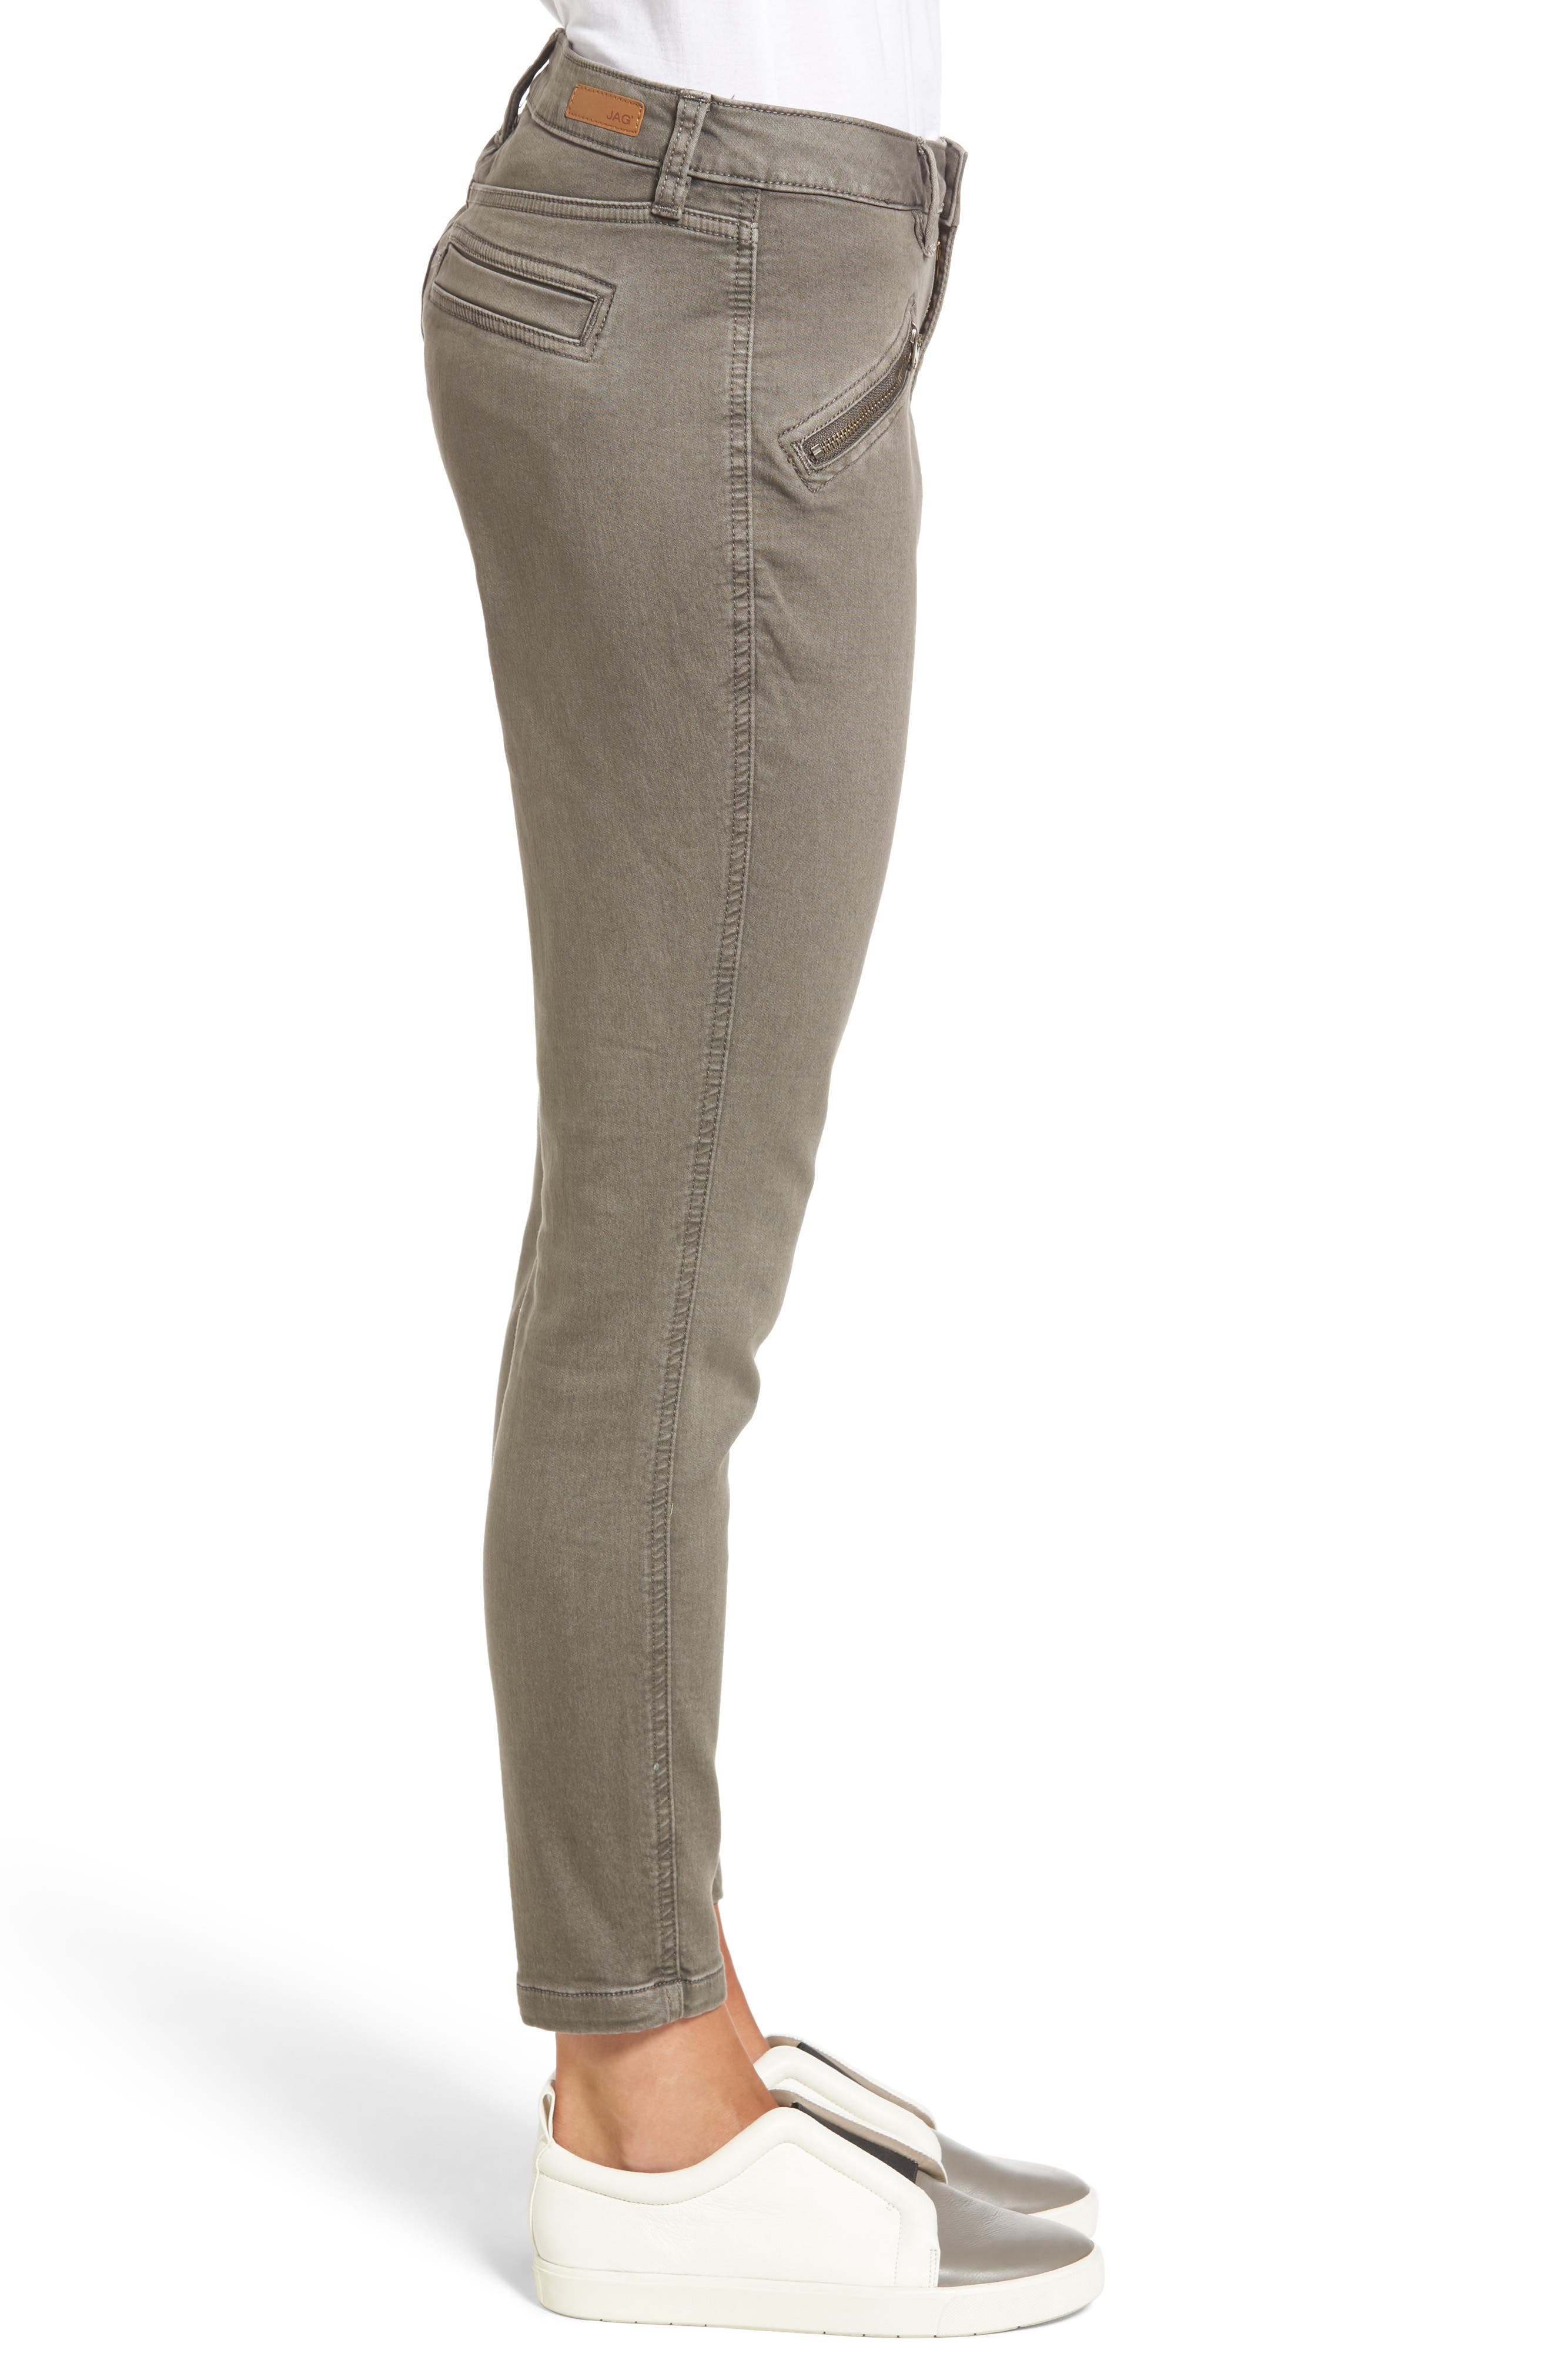 Ryan Knit Skinny Jeans,                             Alternate thumbnail 3, color,                             205